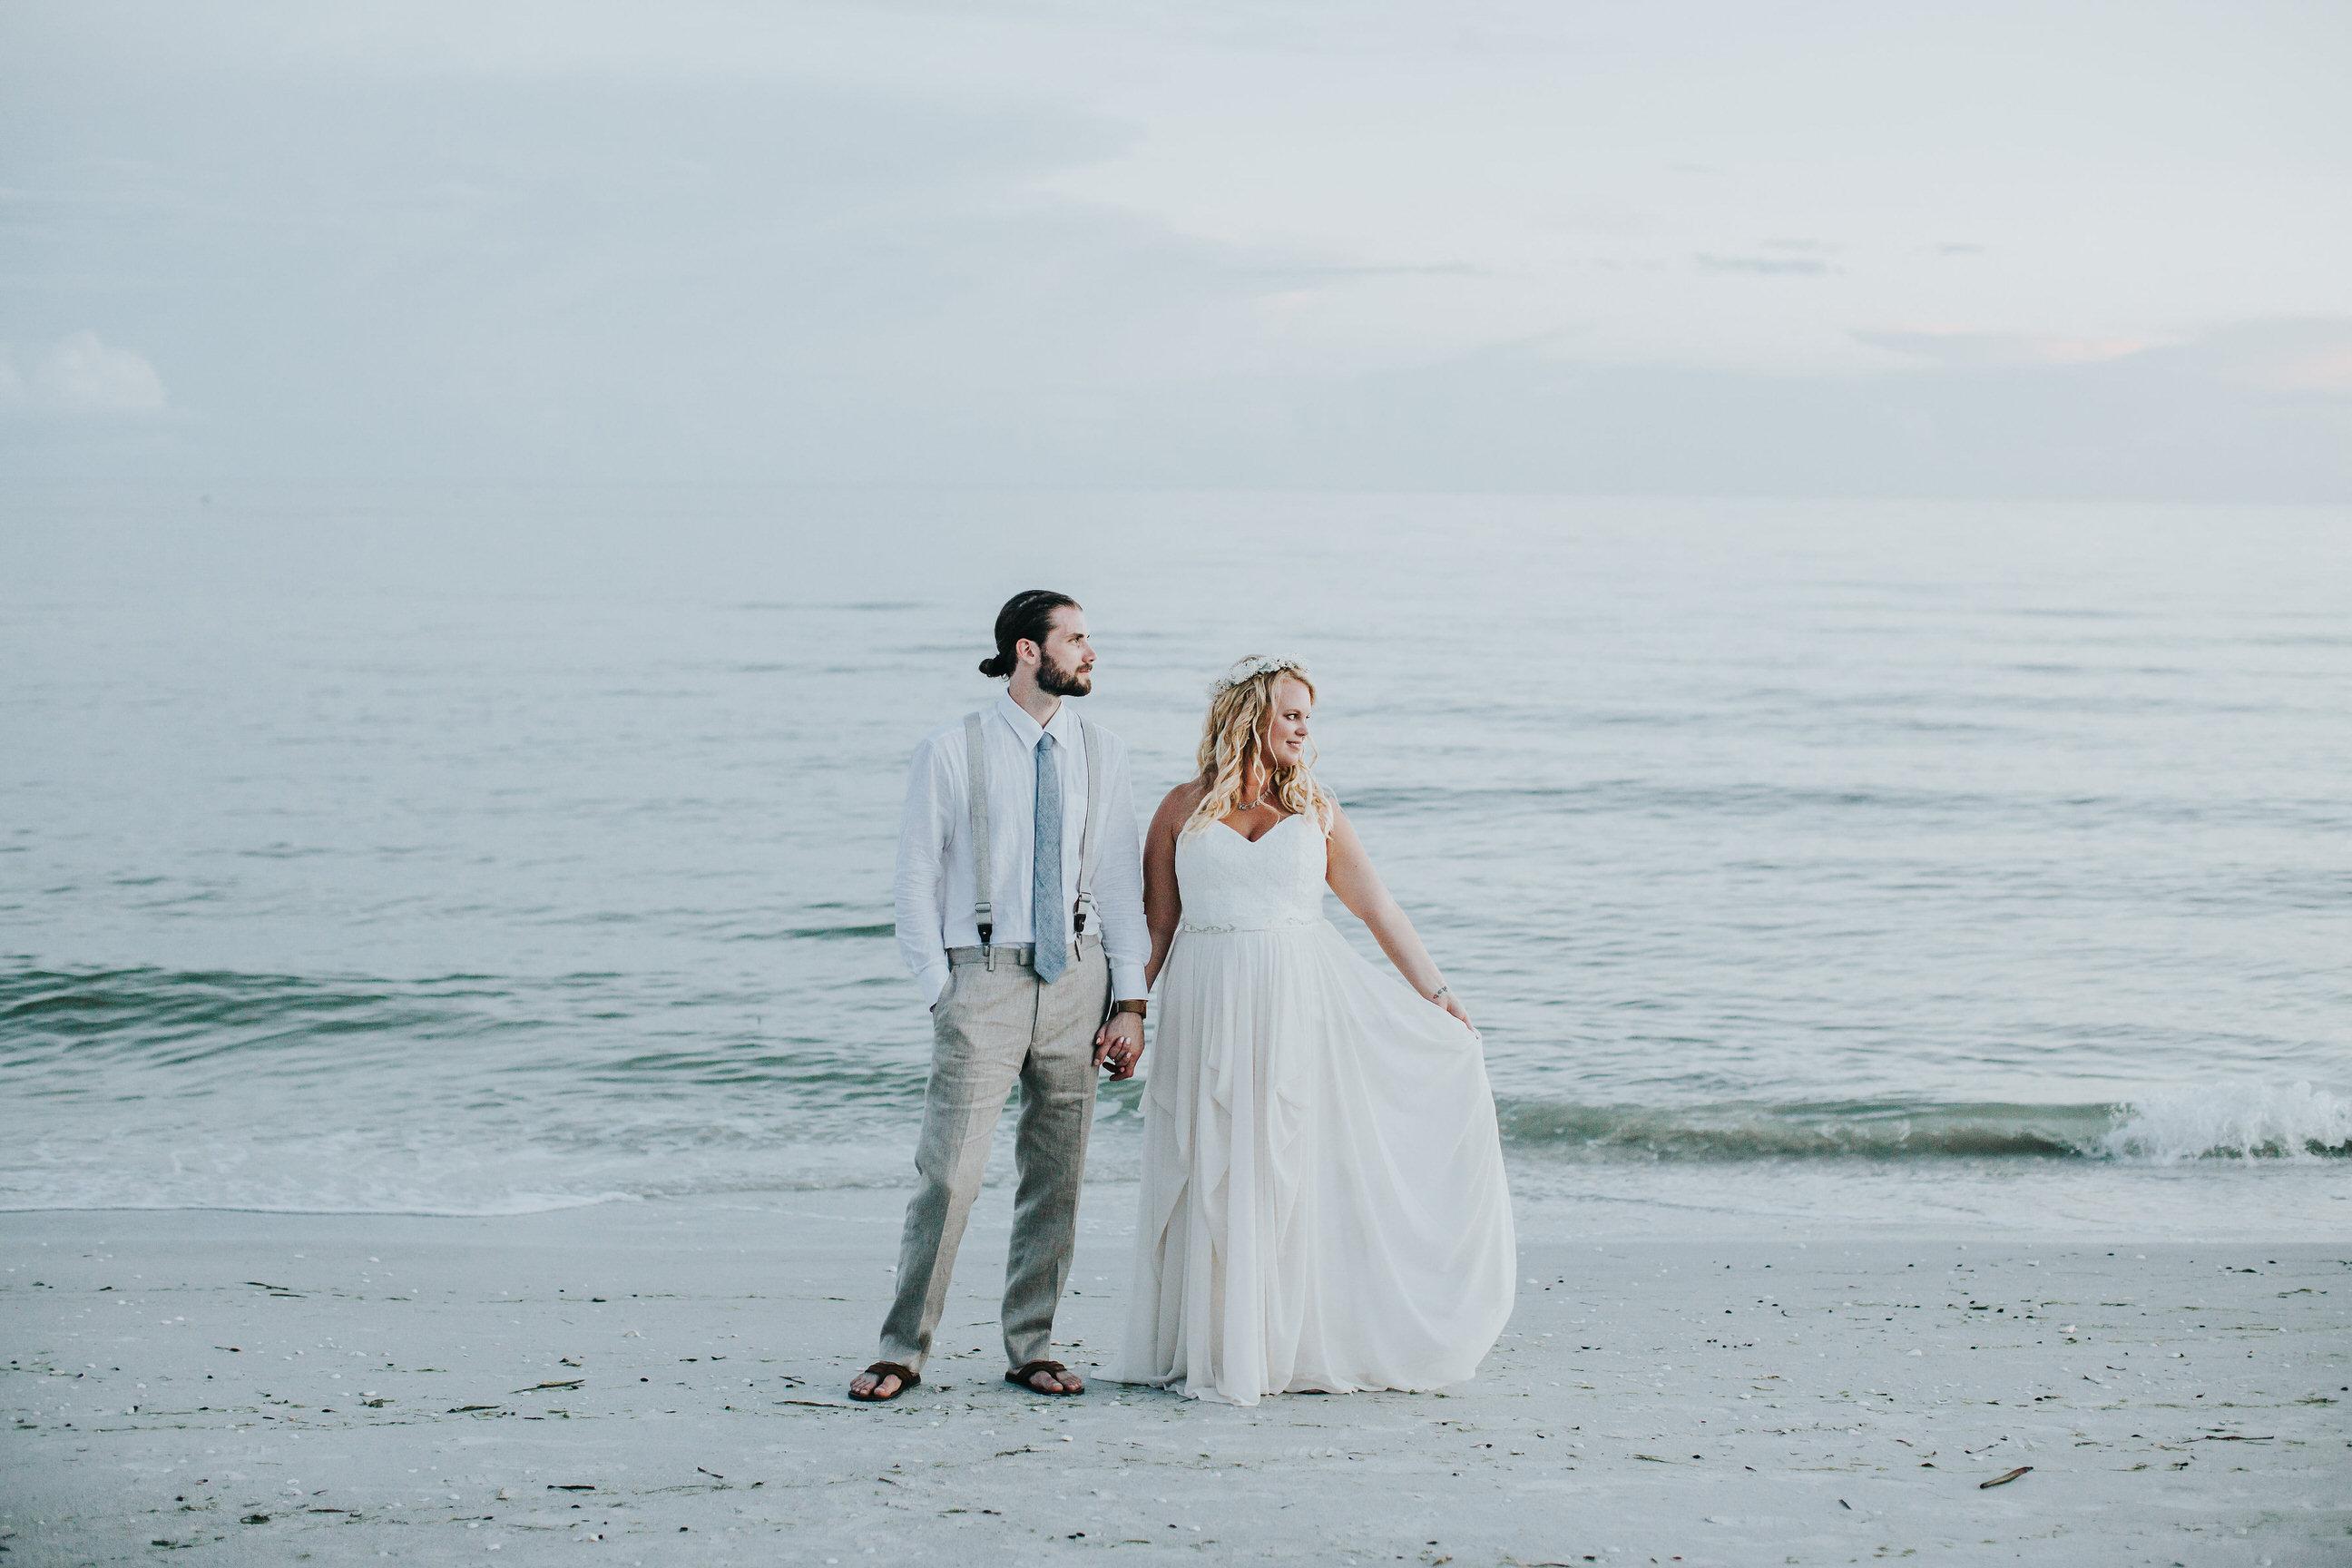 Kate + Blake | Sanibel Island, Florida Wedding - Russell Heeter